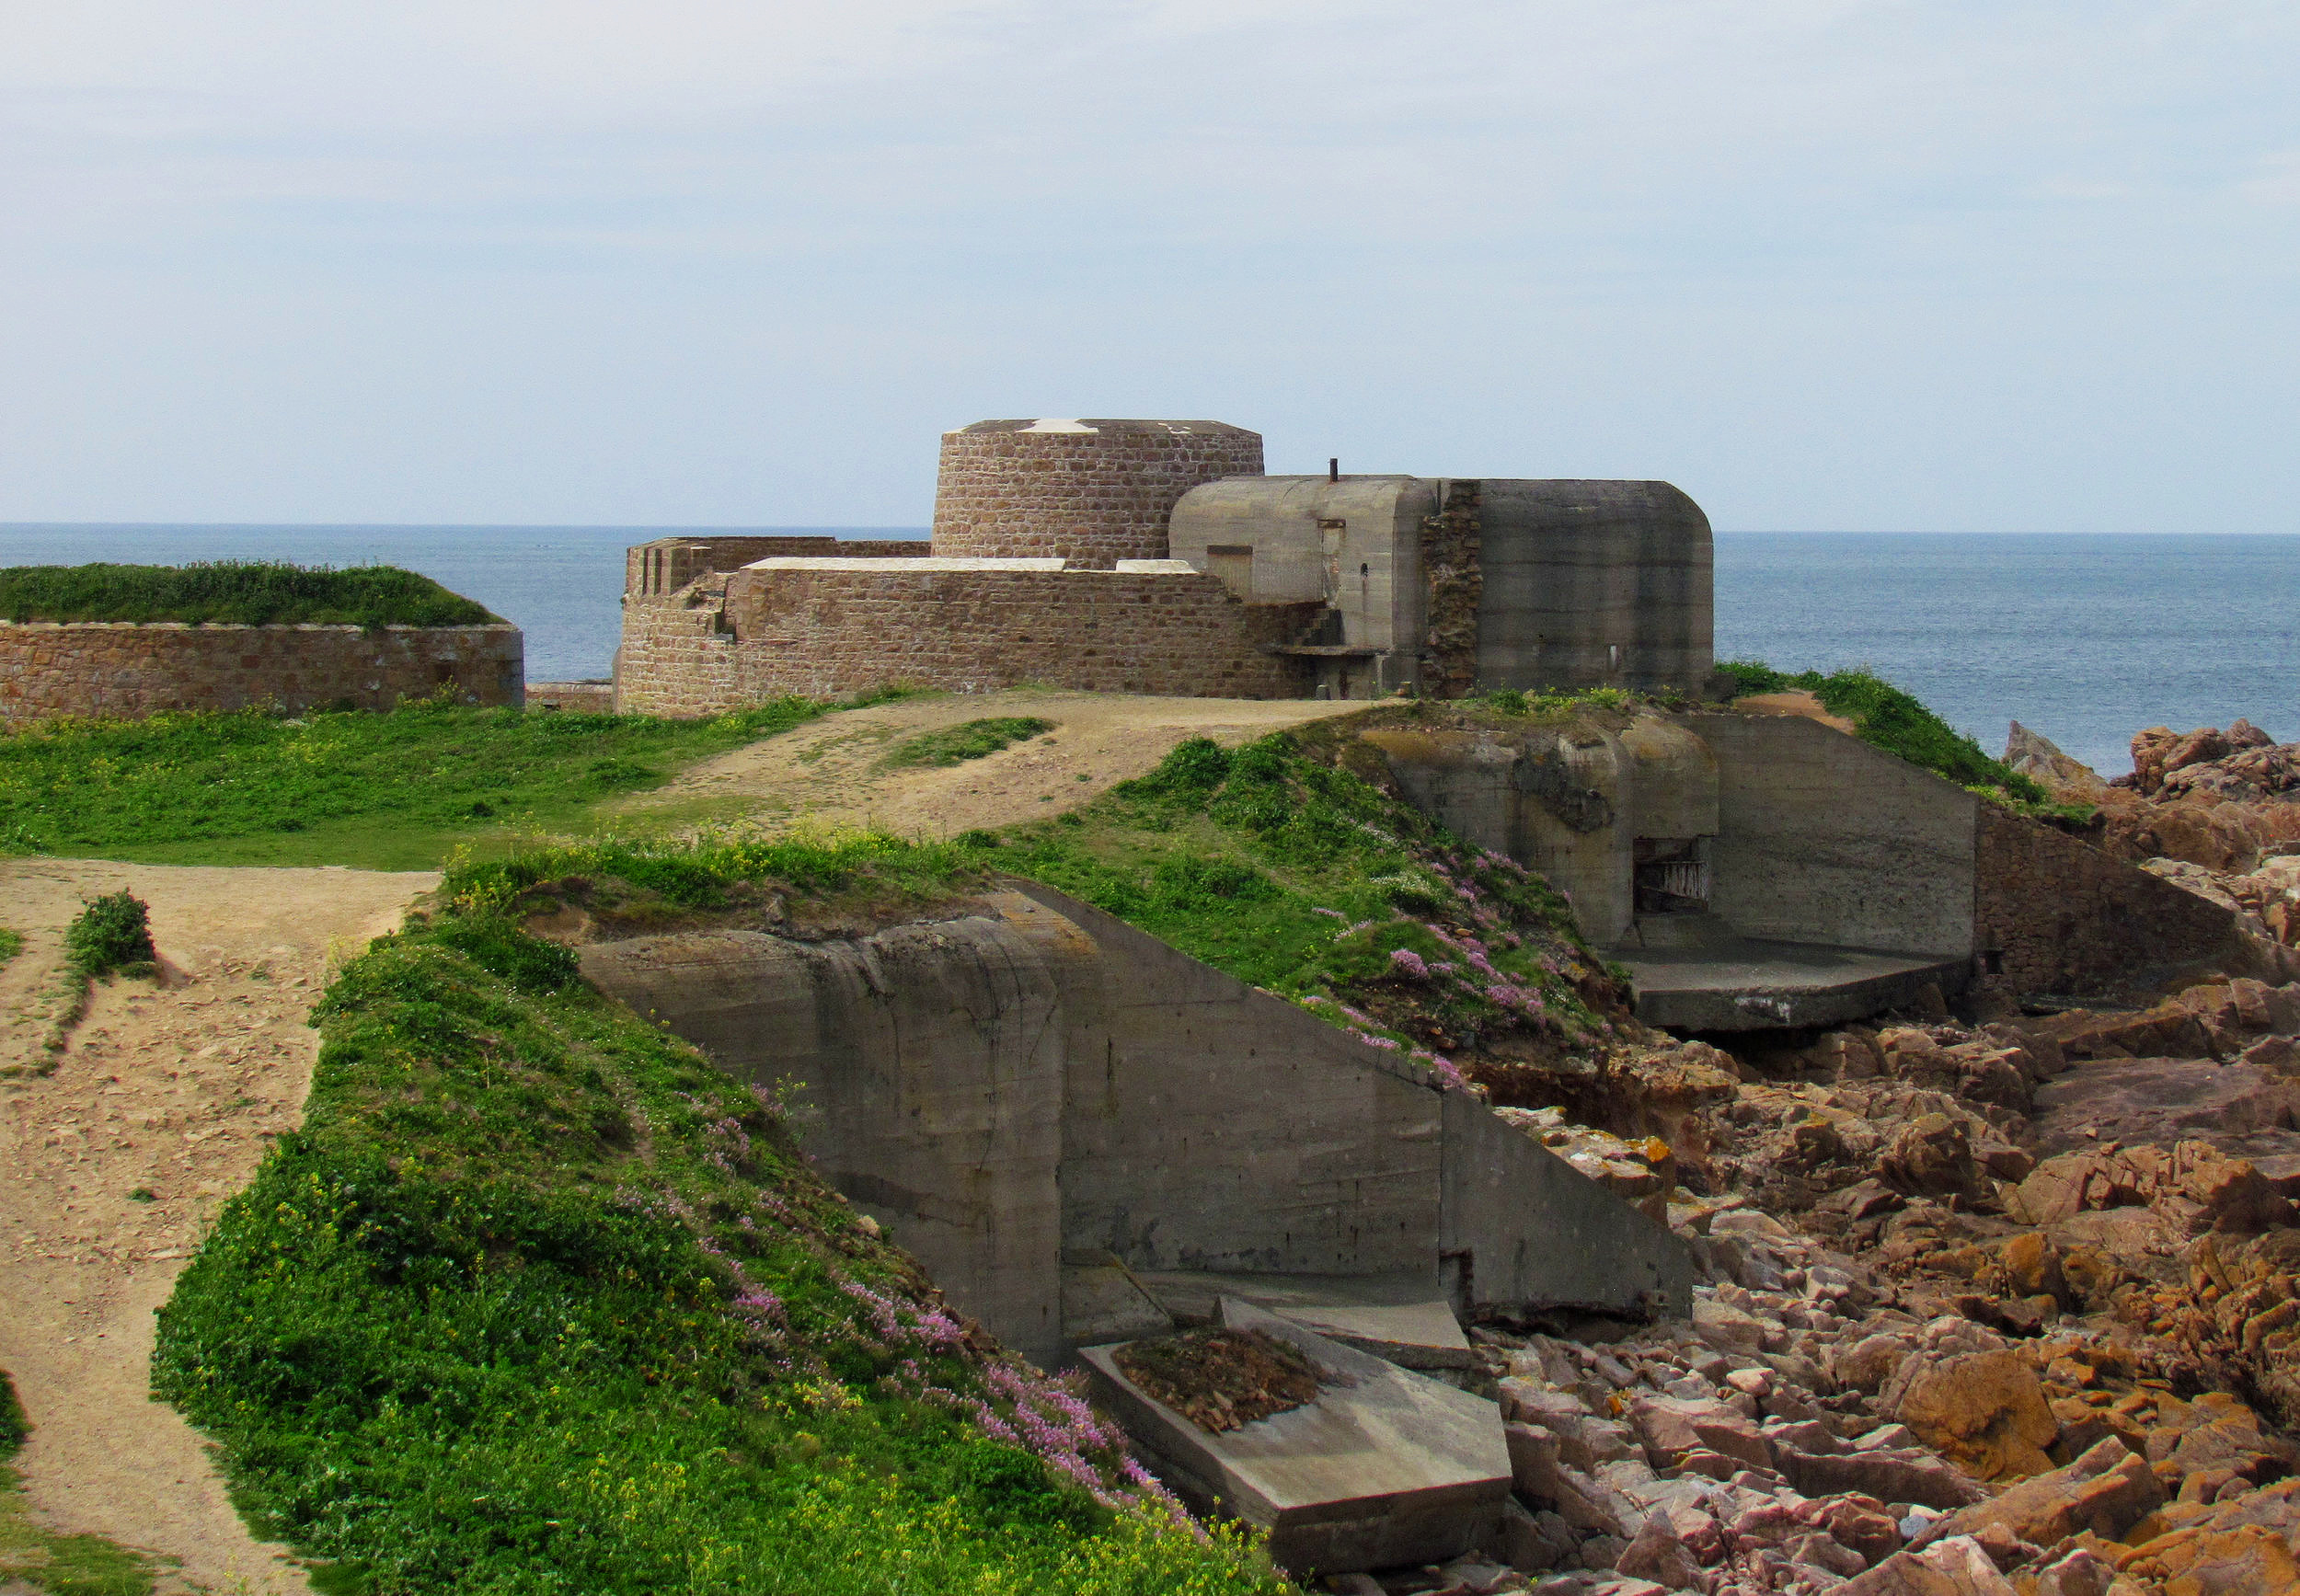 Guernsey, Channel Islands: Fort Hommet Gun Casemate Bunker